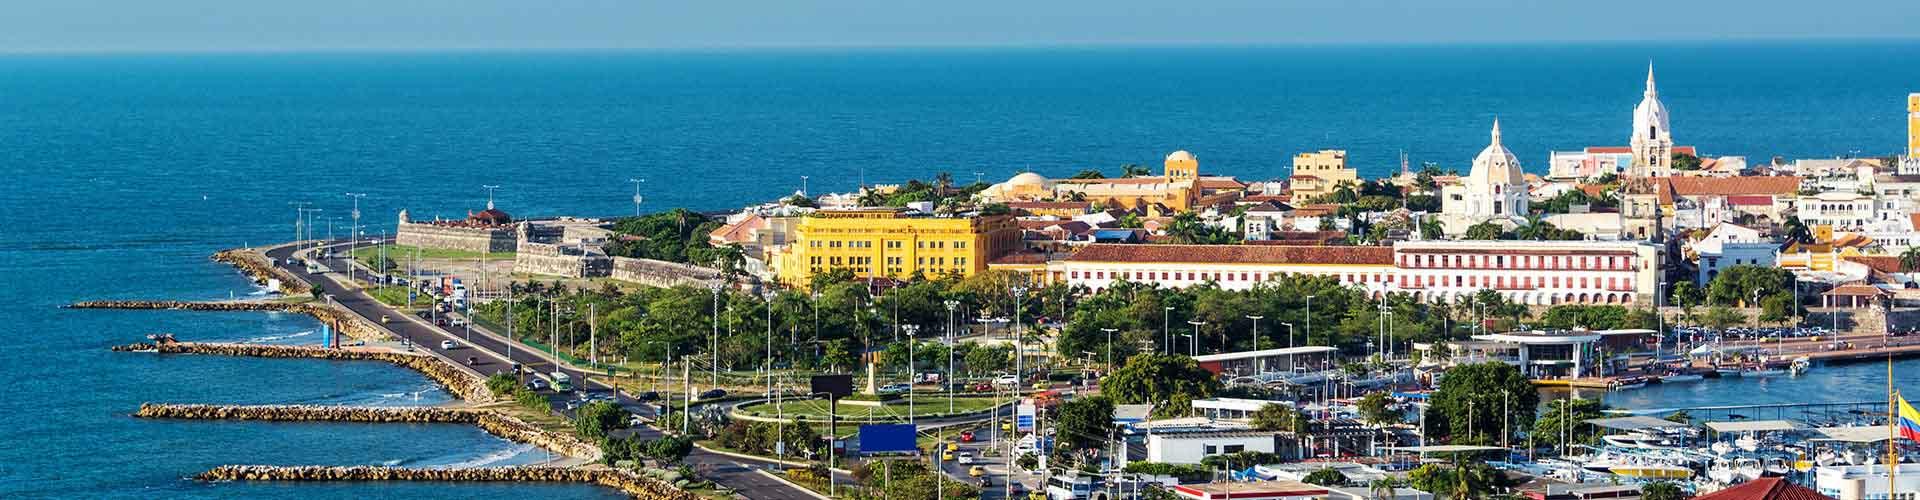 Cartagena de Indias – Hostellit kohteessa Cartagena de Indias. Cartagena de Indias -karttoja, valokuvia ja arvosteluja kaikista Cartagena de Indias -hostelleista.